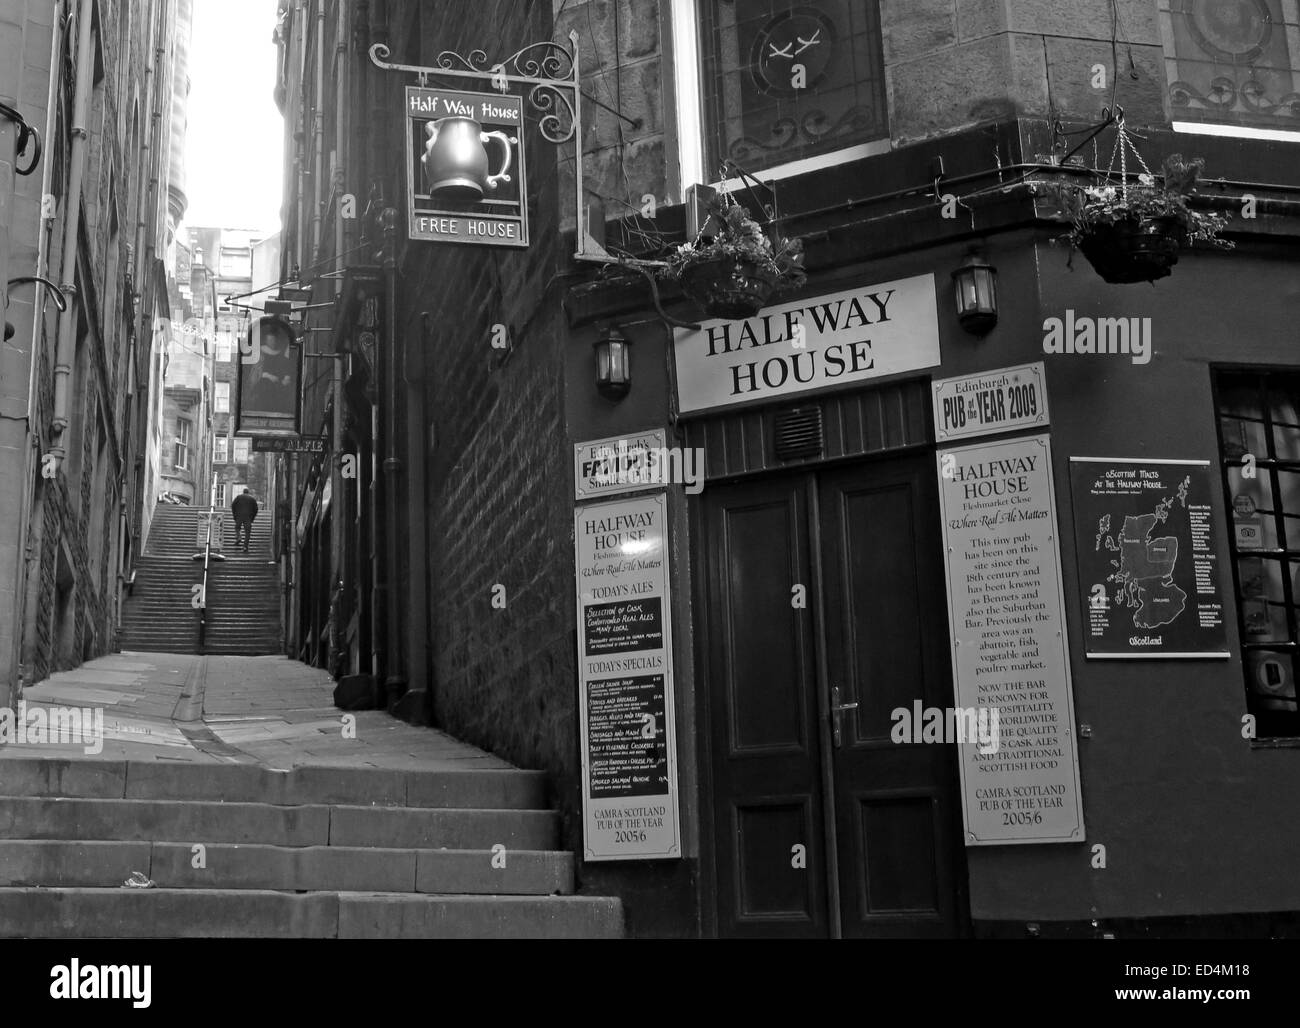 Flesh Market cl pub,public house,real ale,smallest pub,travel,united kingdom Capital CAMRA realale City,Scotland,UK,new,town,newtown,in,mono,monochrome,historic,Black,and,White,menus,outside,beers,freehouse,free,house,Gotonysmith tavern street howff,bothy,camra,city,cityscape,claustrophobia,claustrophobic,close,destination,drink,eat,edinburgh,europe,european,festival,food,half,halfway,half-way,high street,holiday,leisure,literature,novel,pub,public house,rankin,rebus,royal mile,scotland,scottish,tourist,travel,uk,vacation,way,Scotlands History,Scotlands History